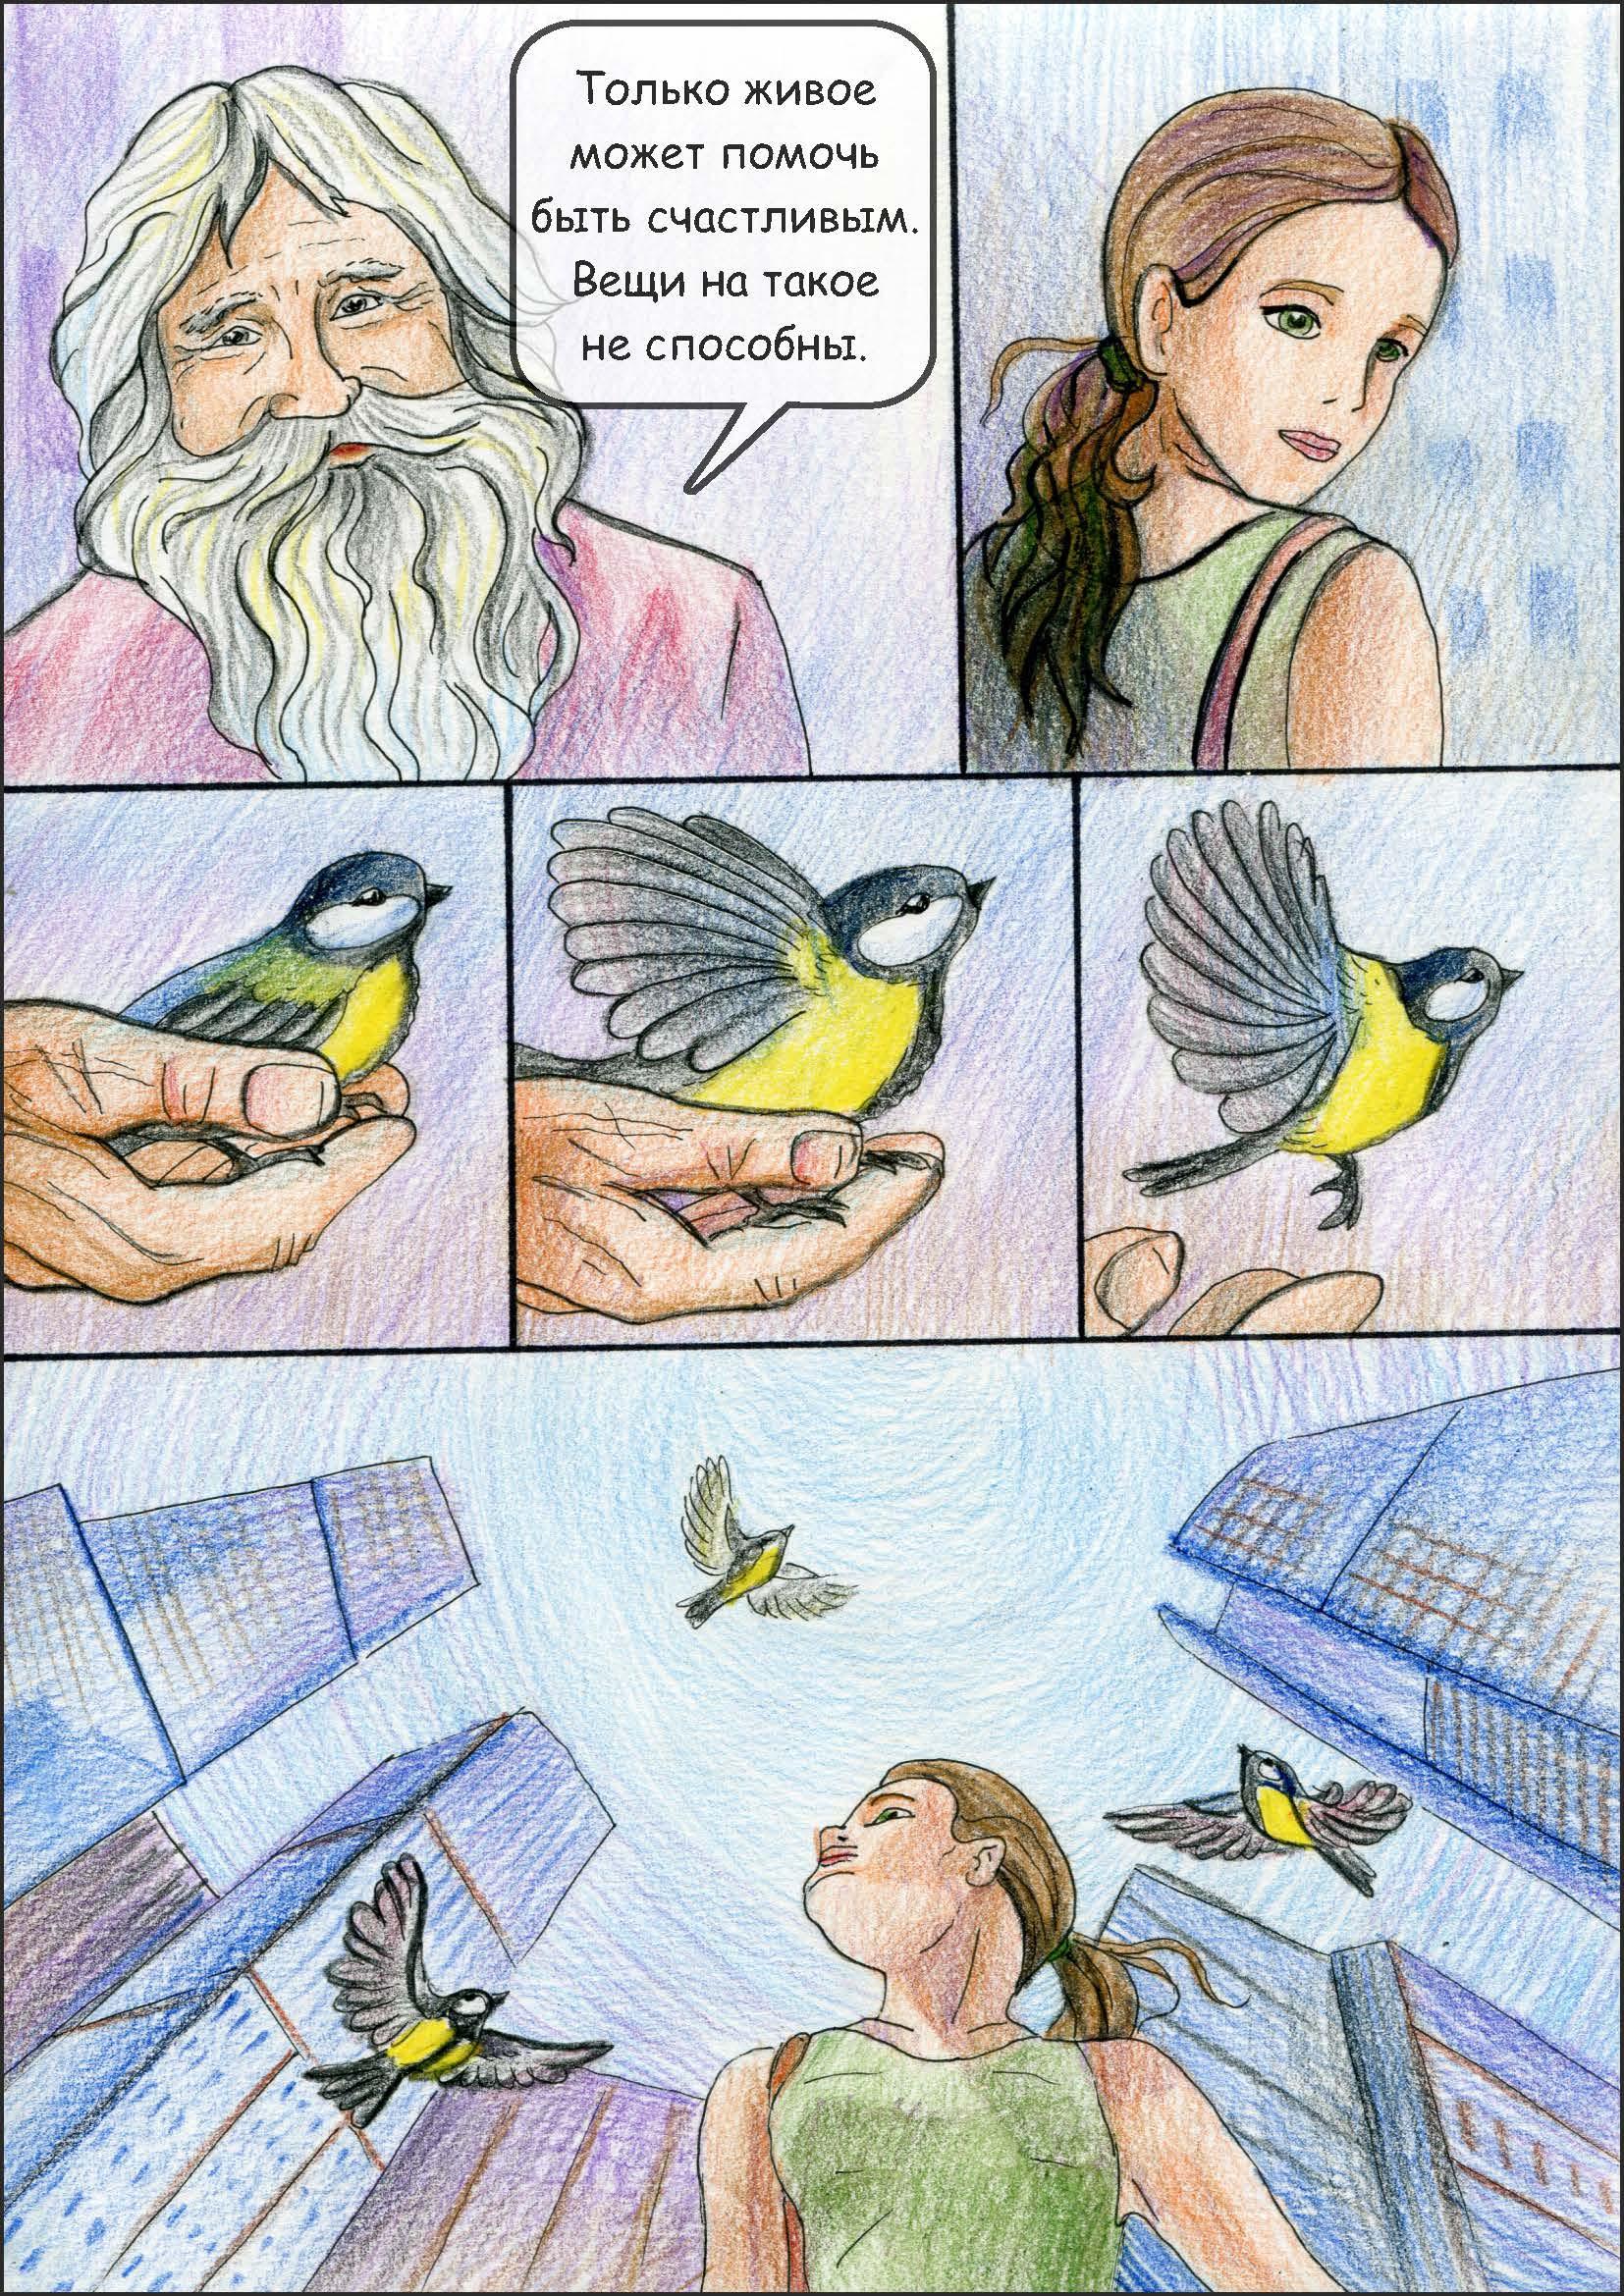 Анна Гейдебрехт. Комикс Зовущая мечта (6).jpg